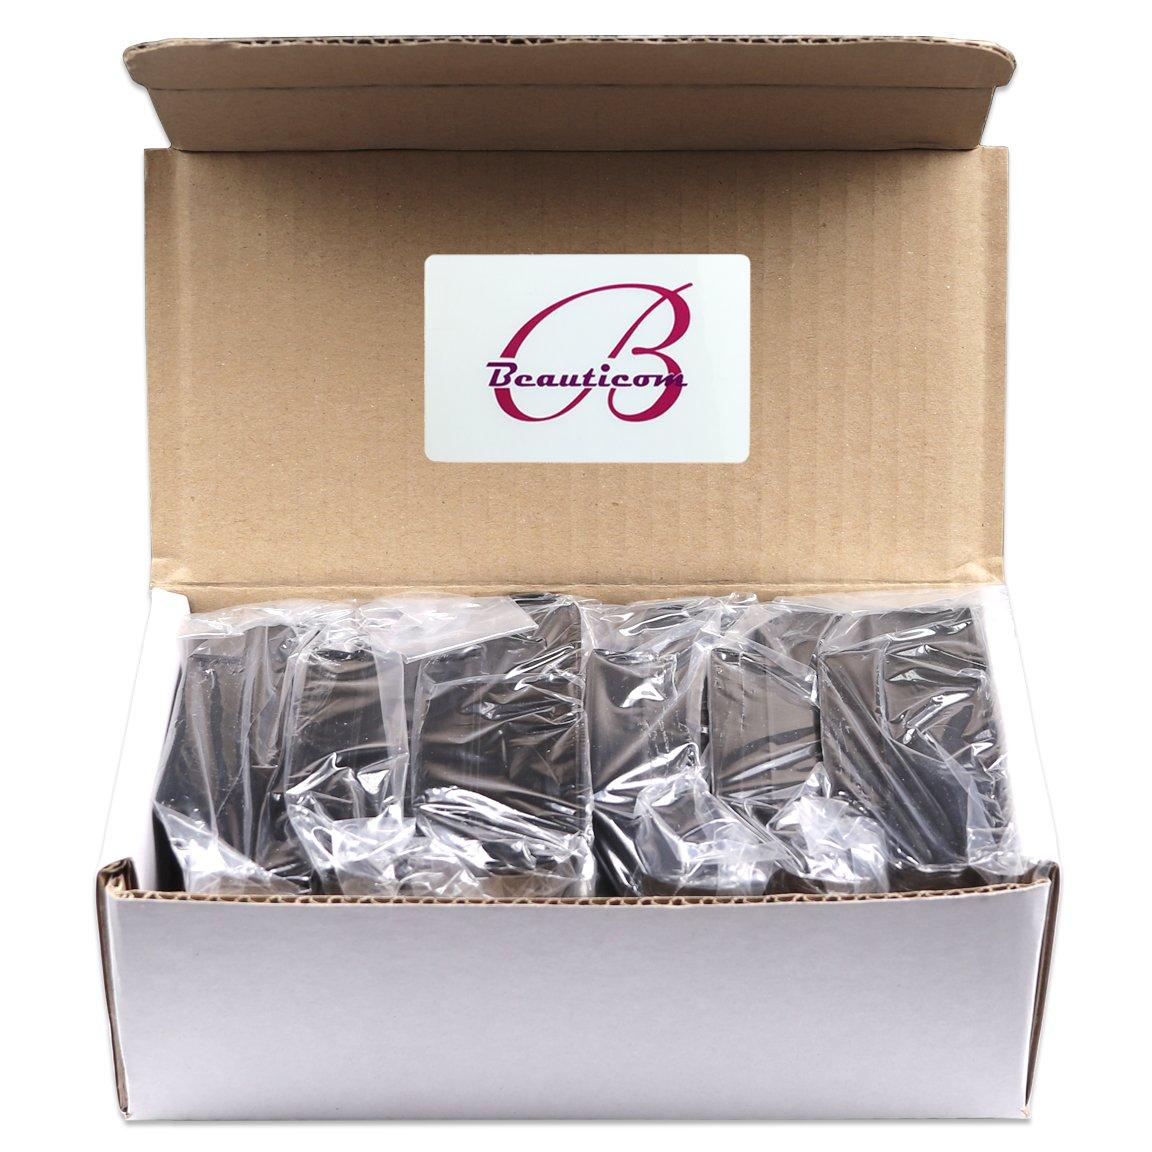 Amazon.com : Deflecto Business Card Holder, Single Compartment, 3-3 ...